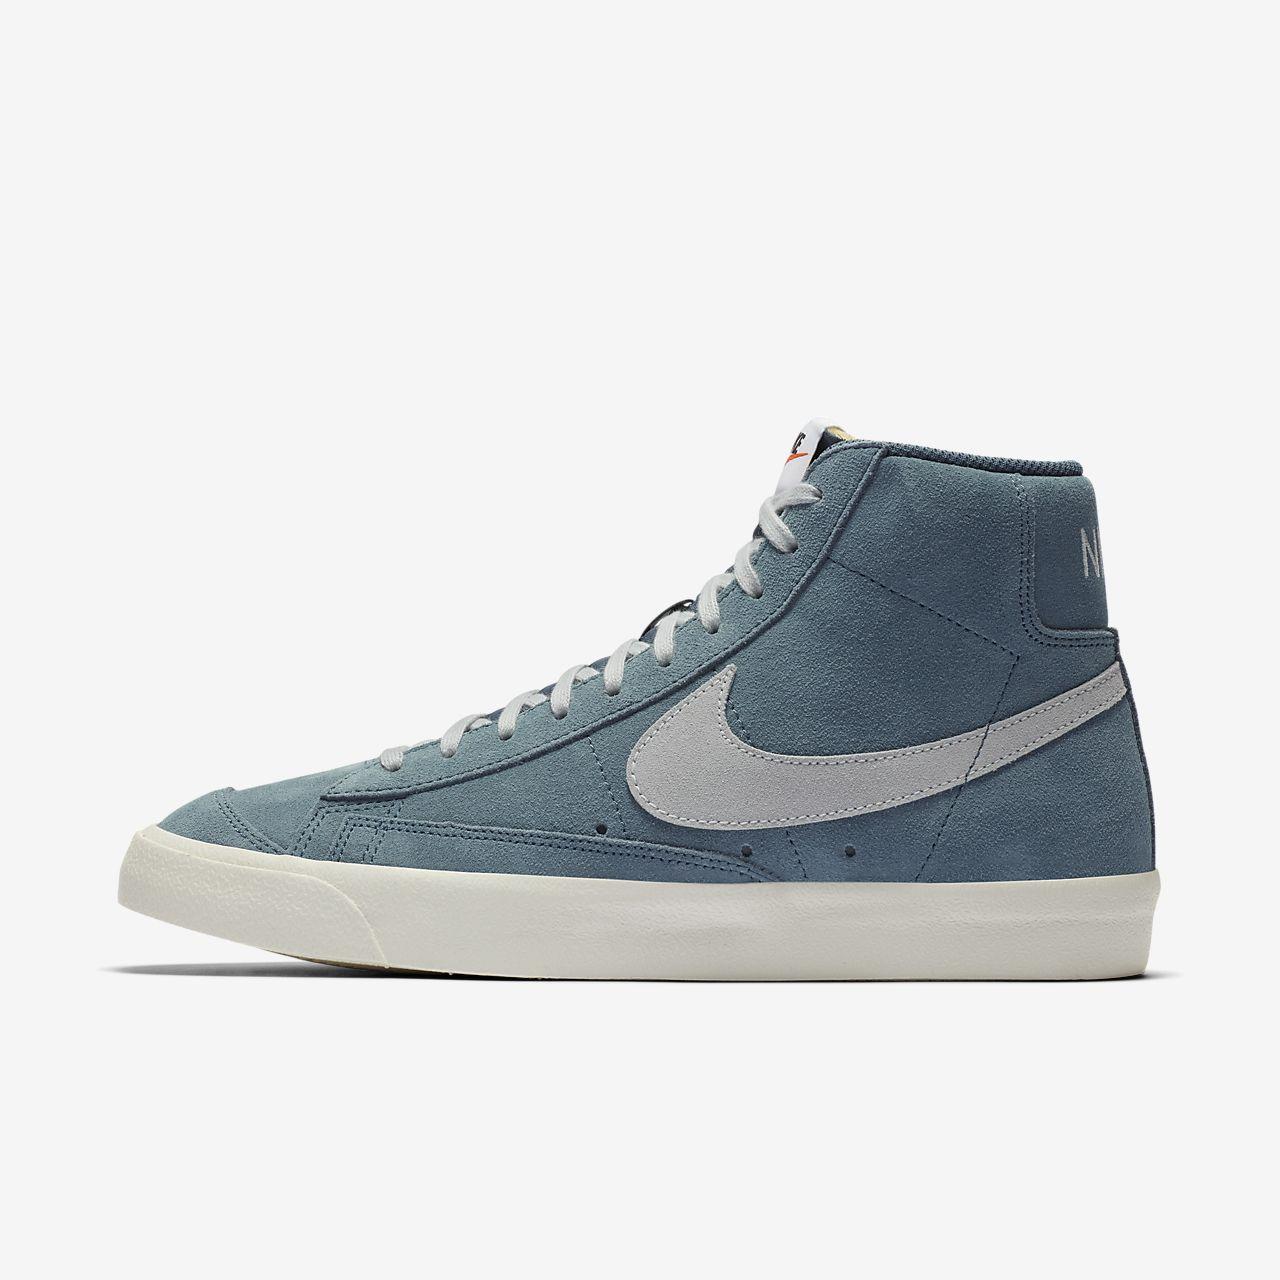 Nike Sportswear BLAZER MID VNTG SUEDE High top trainers